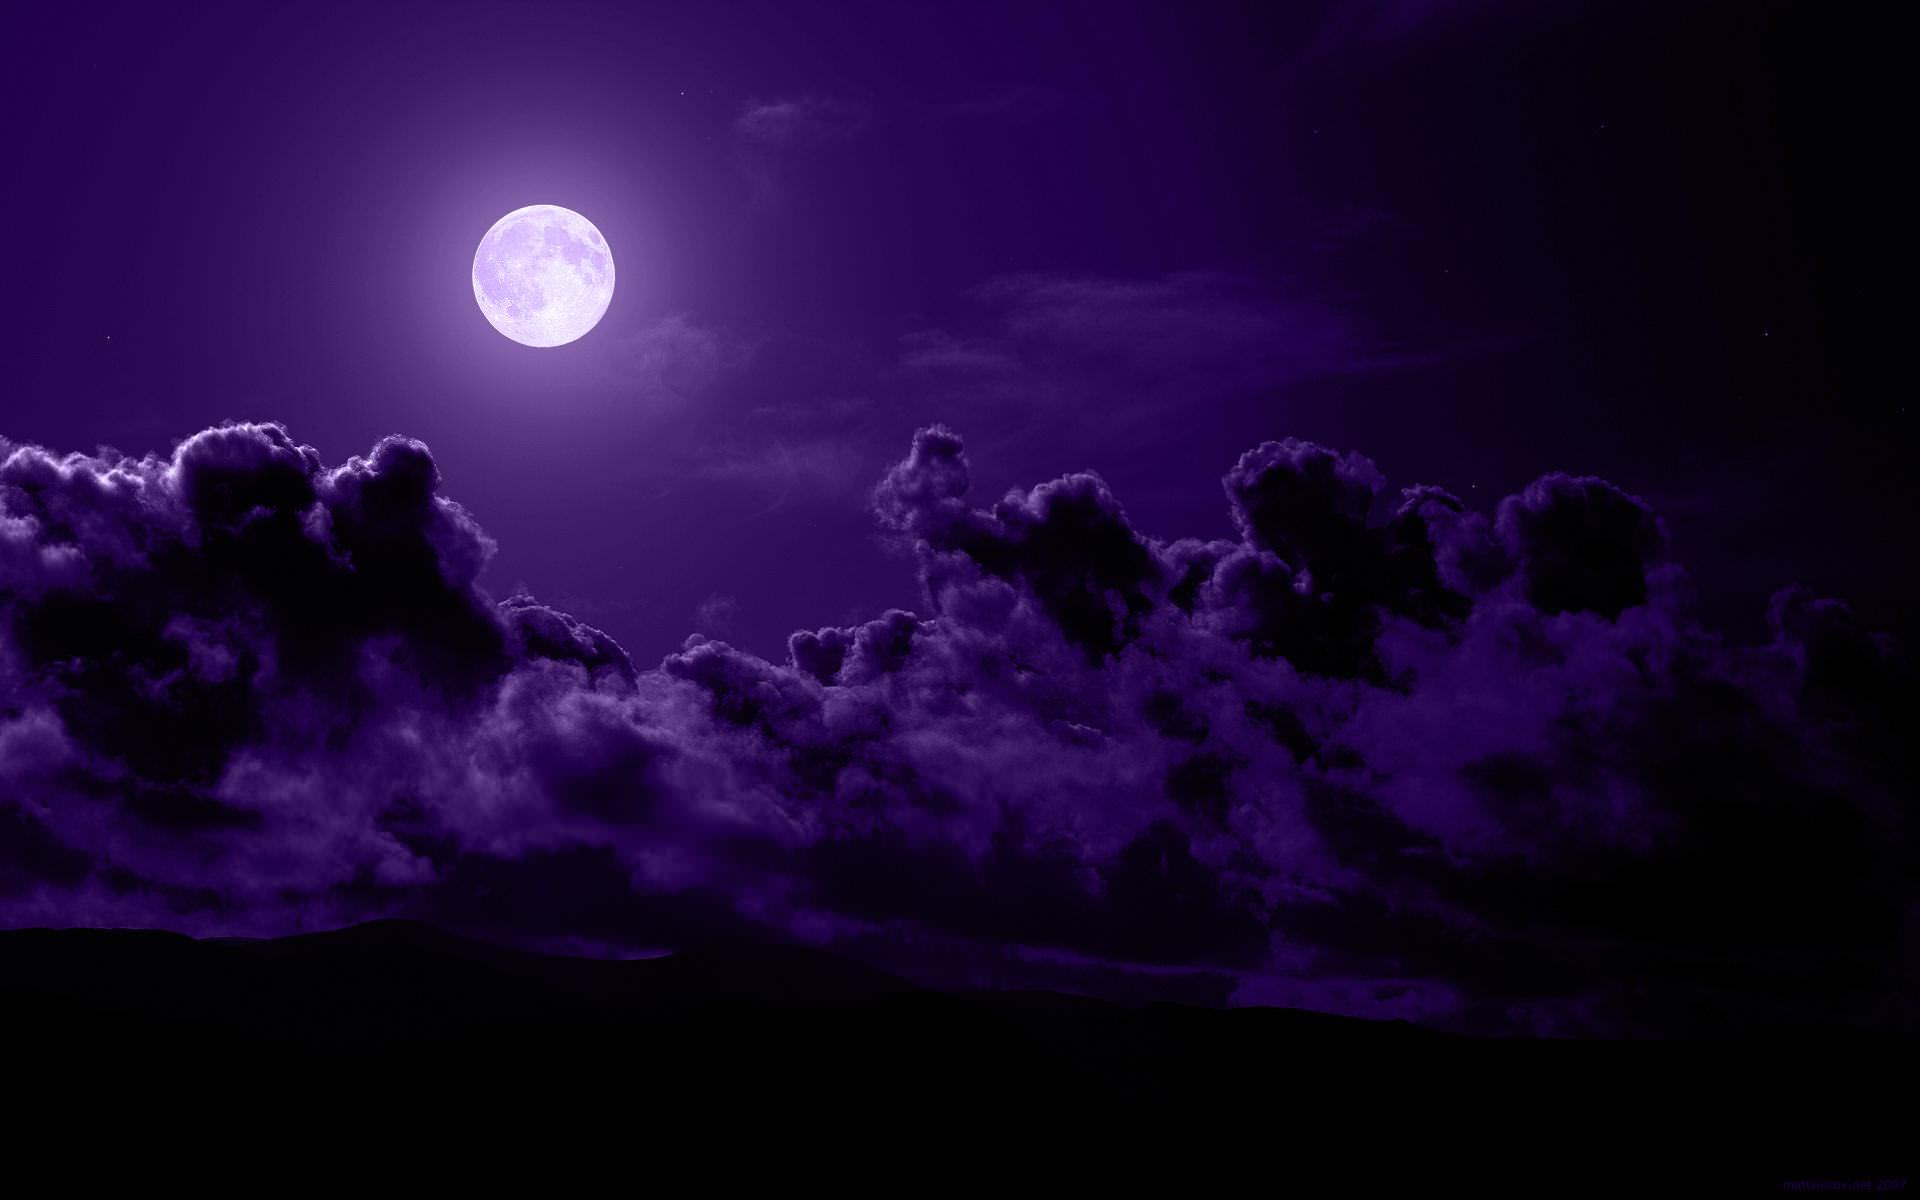 210+ Amazing Purple Backgrounds